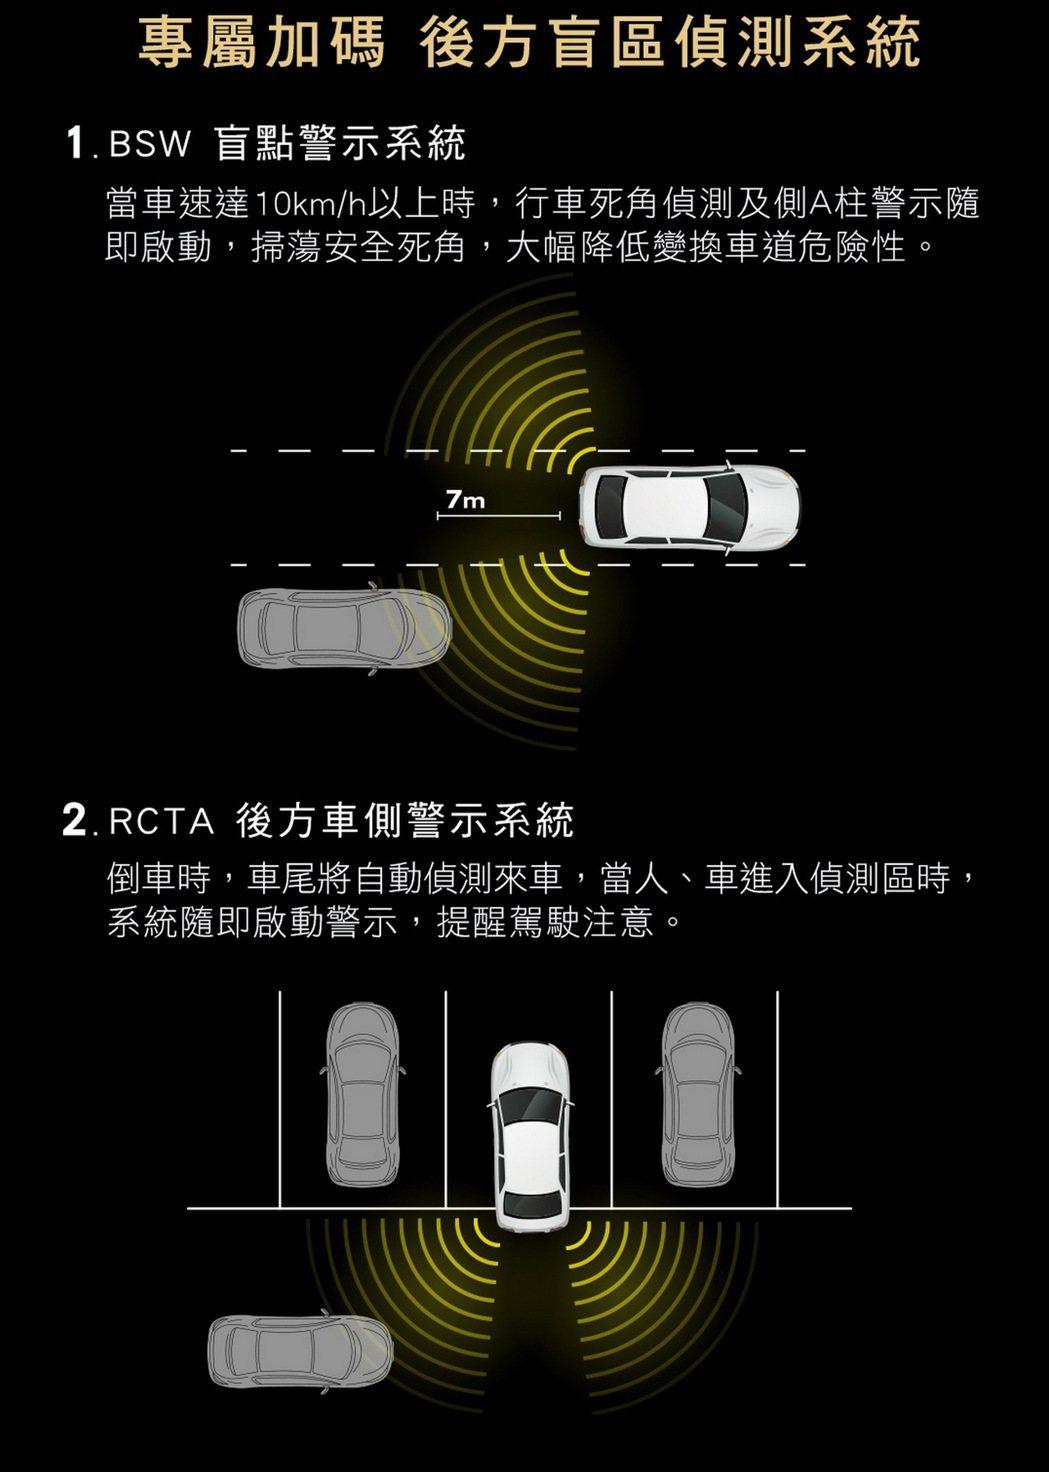 NISSAN X-TRAIL玩美影音版及豪華影音版免費升級BSW盲點警示系統及RCTA後方車側警示系統,有效提升車輛行駛及倒車安全。 圖/裕隆日產提供